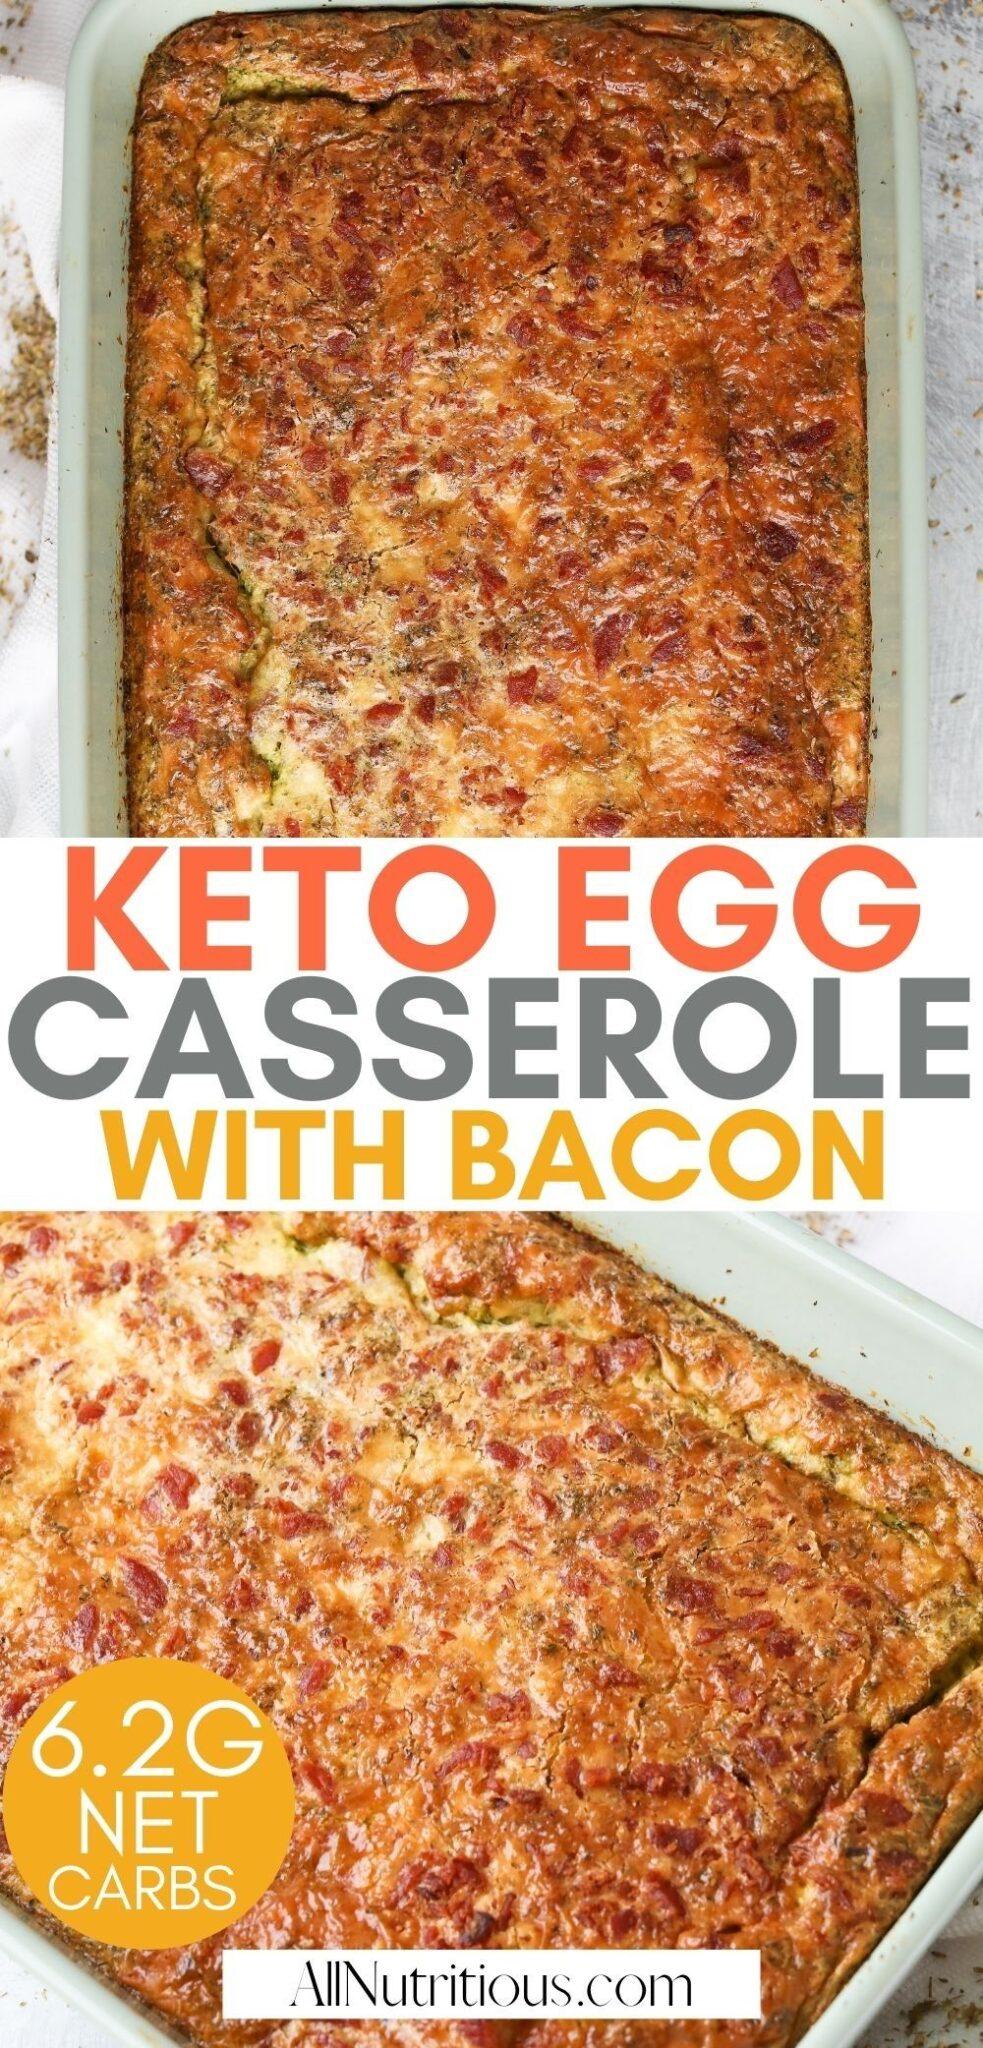 keto egg casserole with bacon